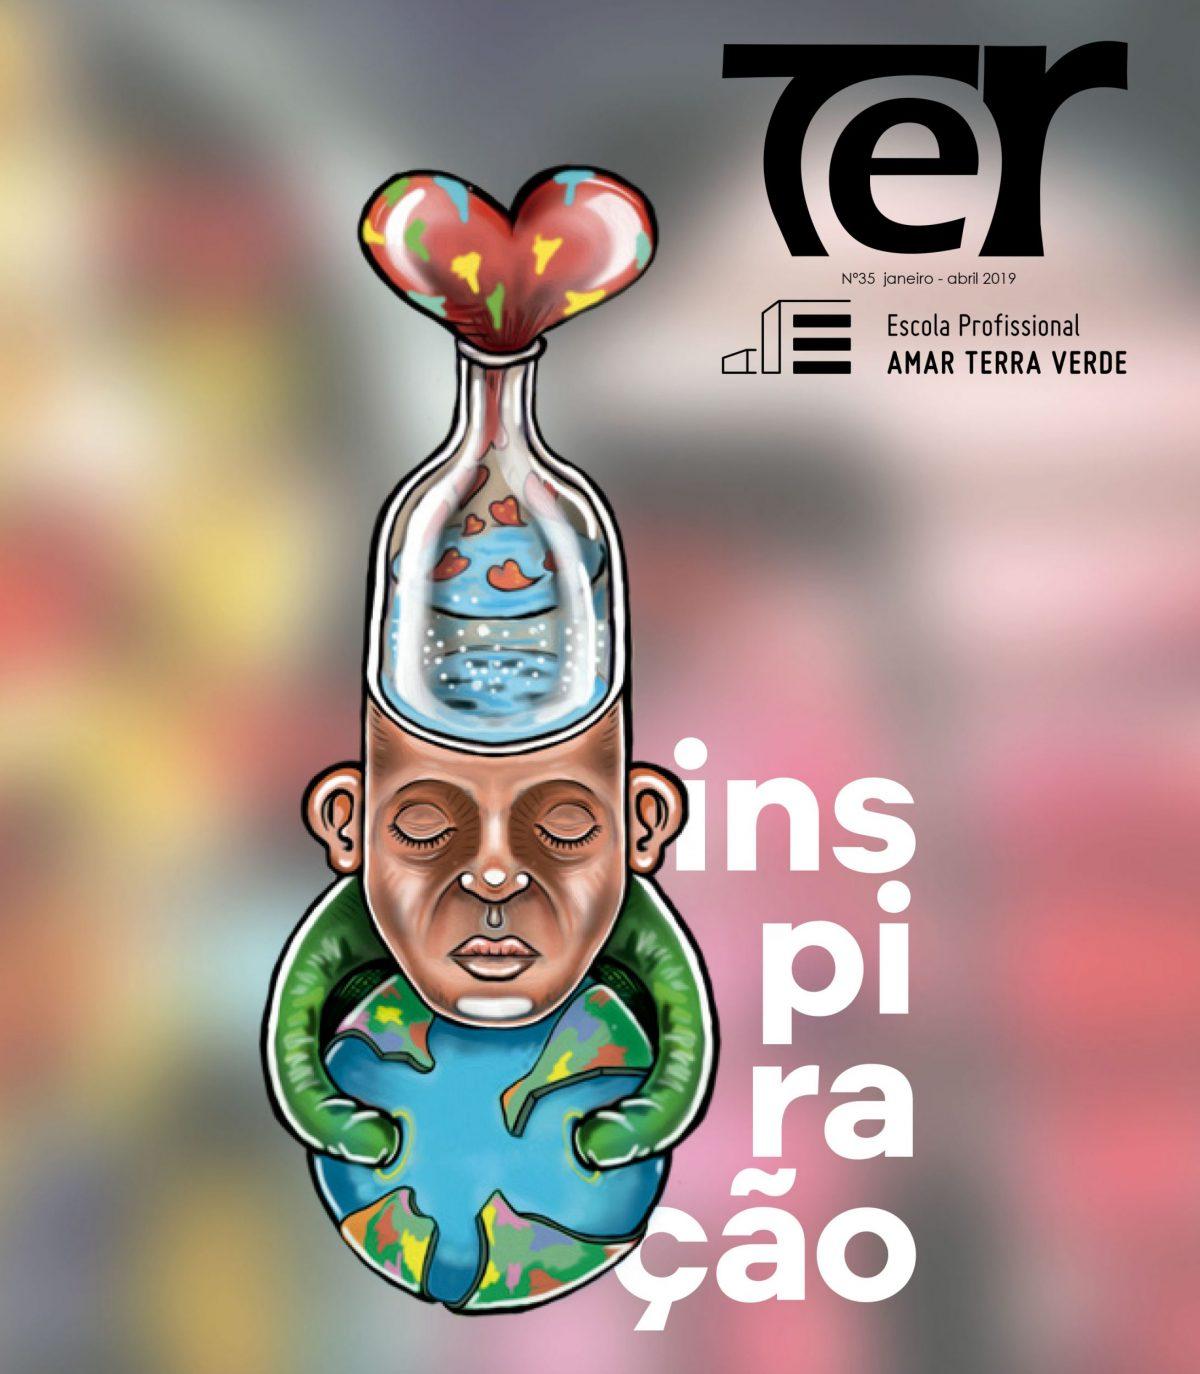 epatv-revista-ter5